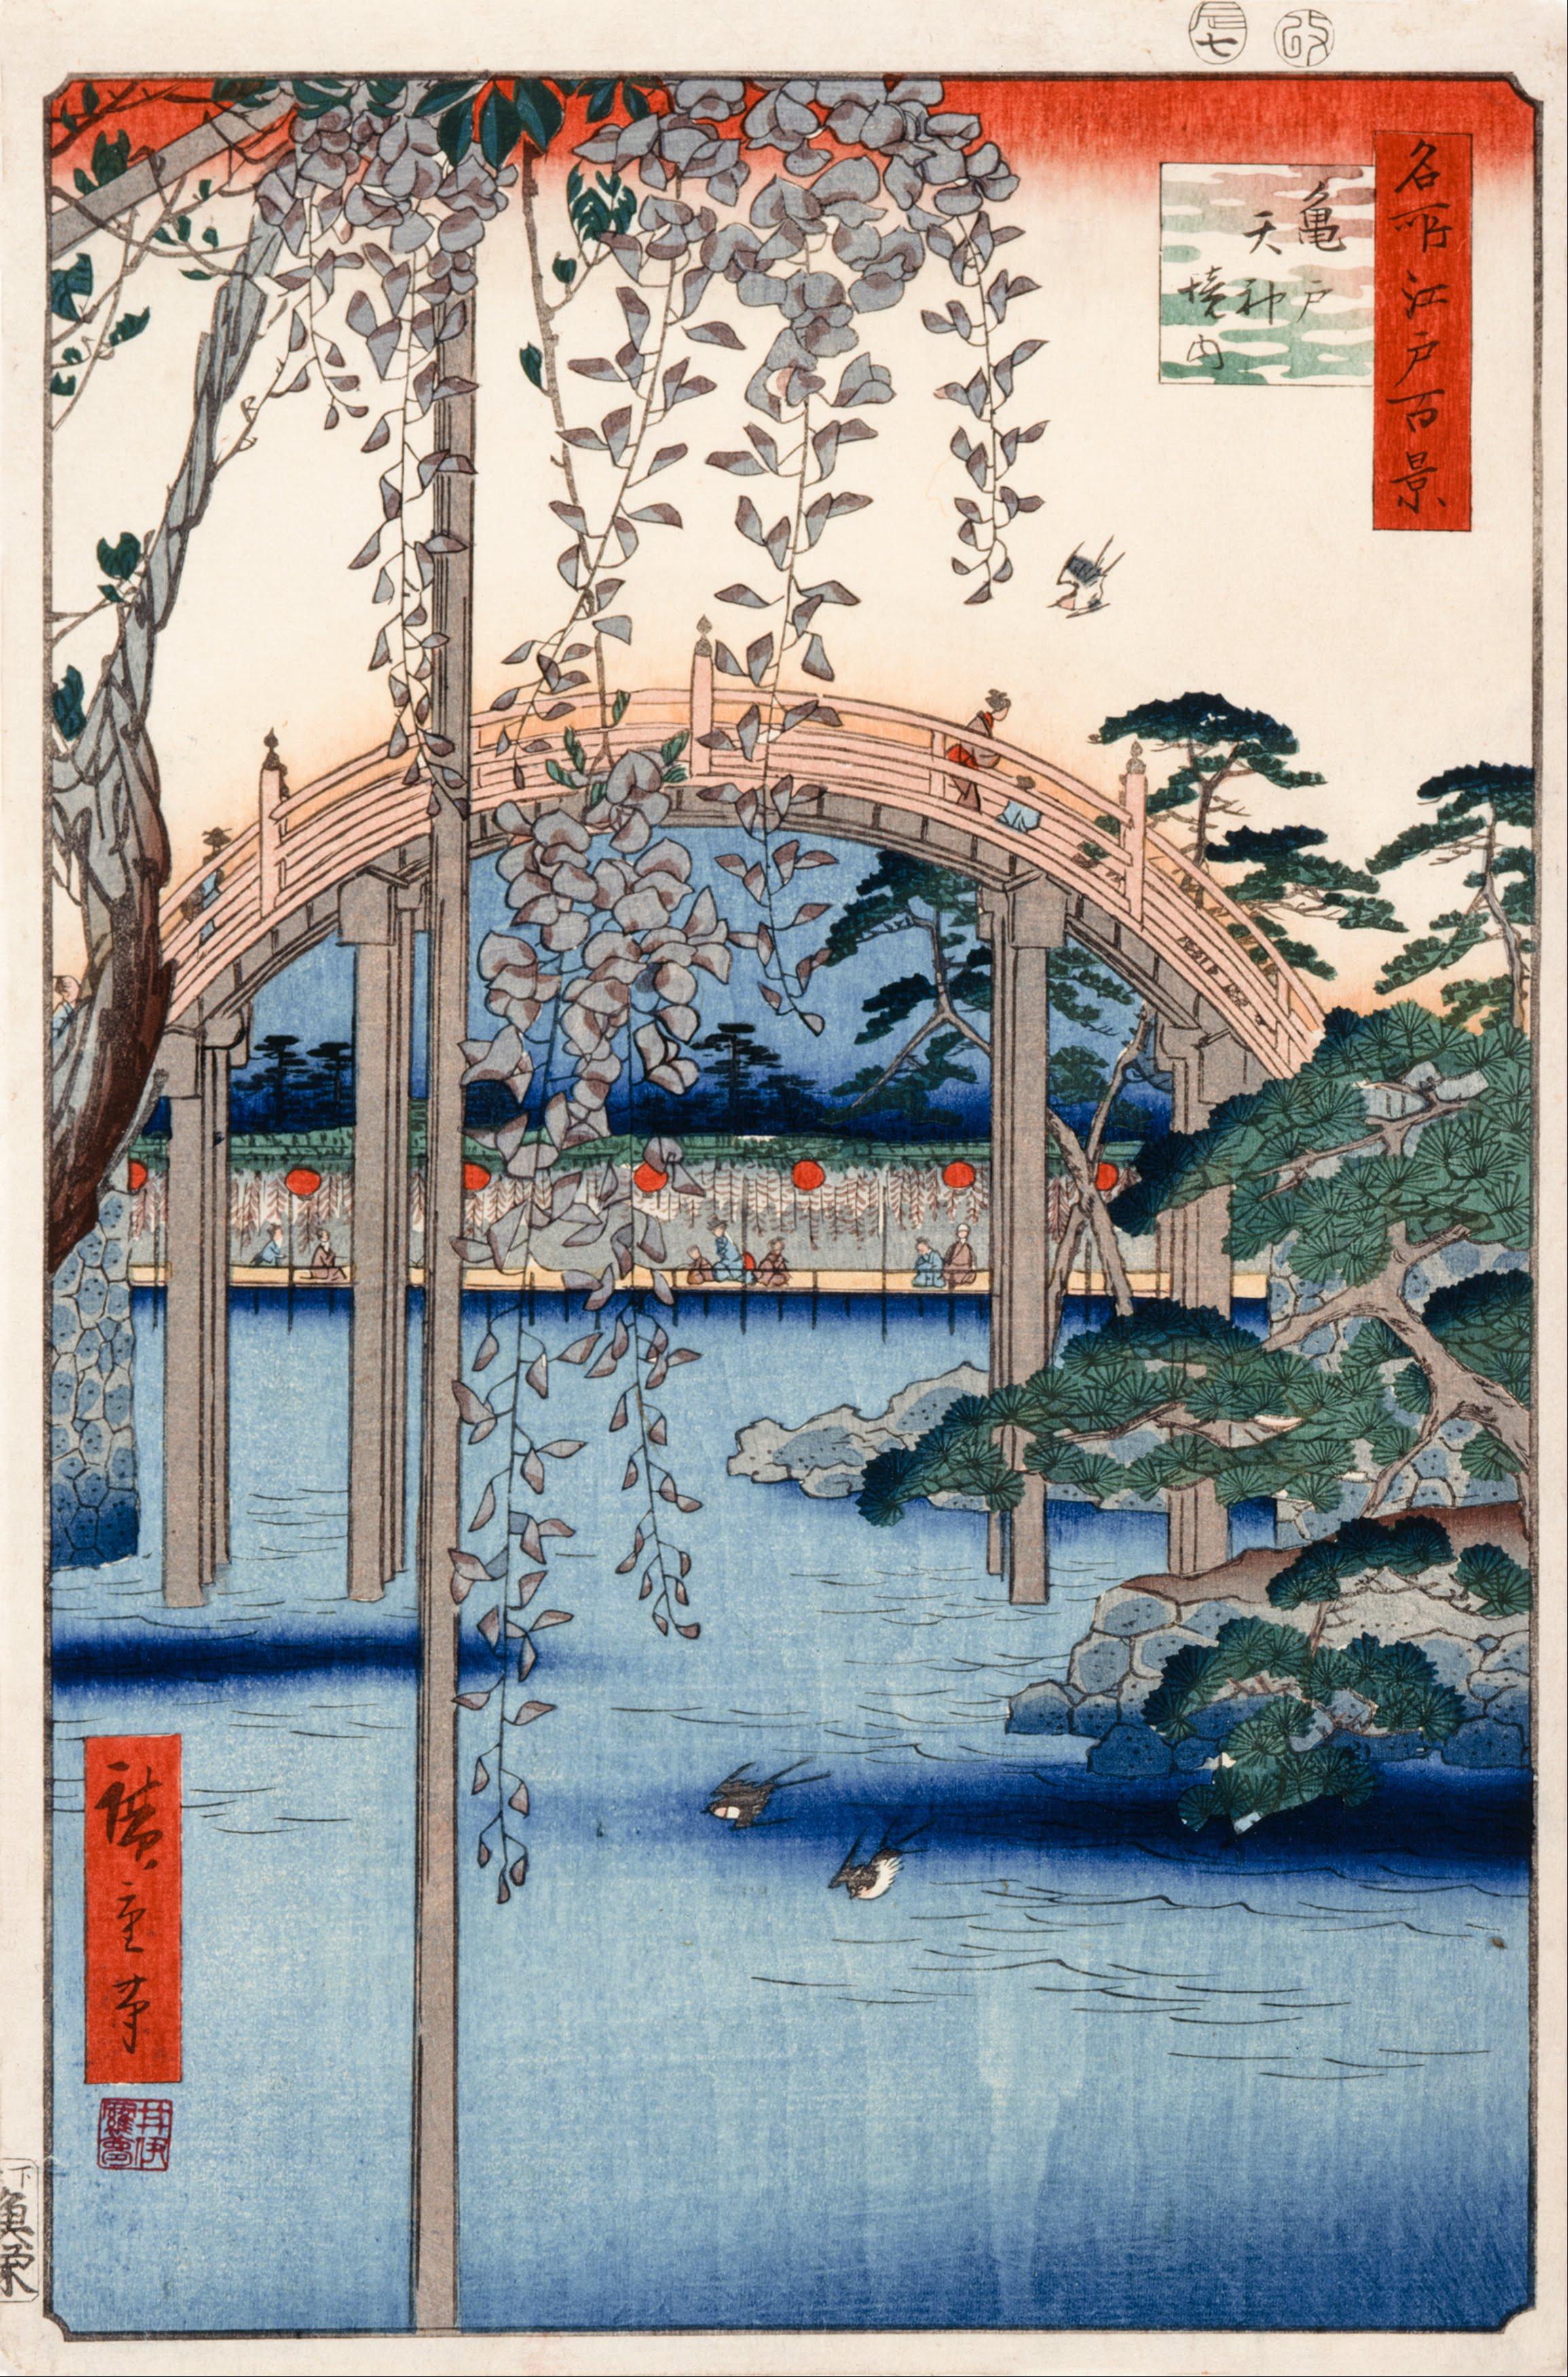 File:Utagawa Hiroshige - No. 57, Grounds of Kameido Tenjin Shrine (from One Hundred Famous Views ...